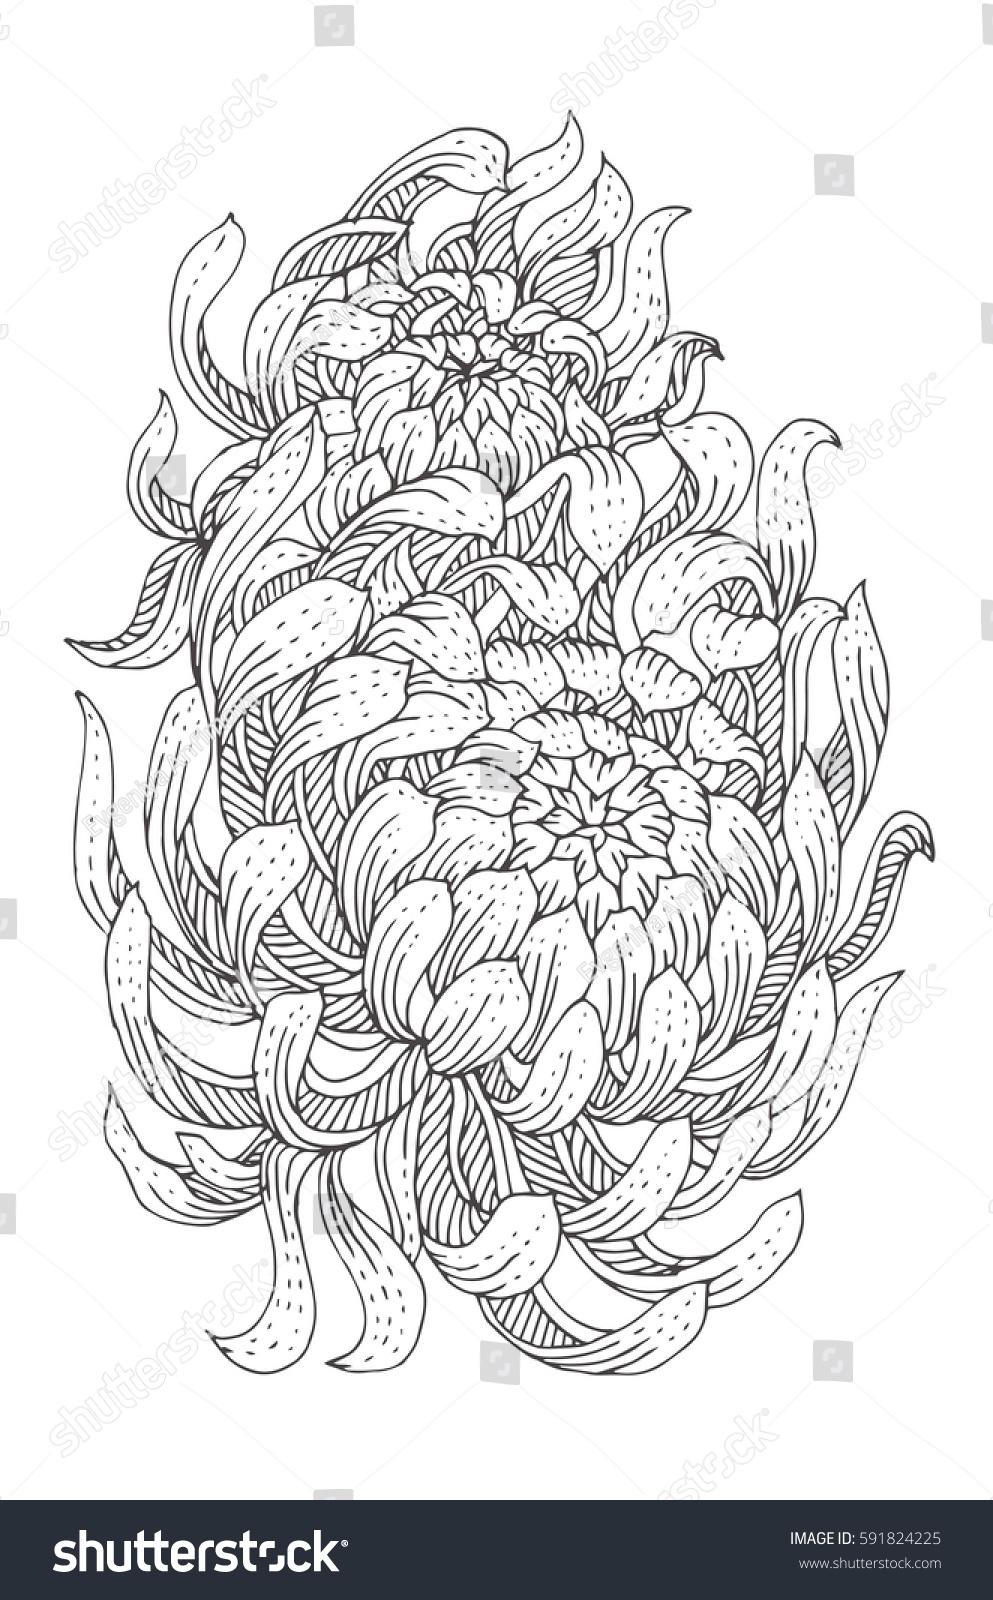 chrysanthemum book coloring pages eliolera - Chrysanthemum Book Coloring Pages